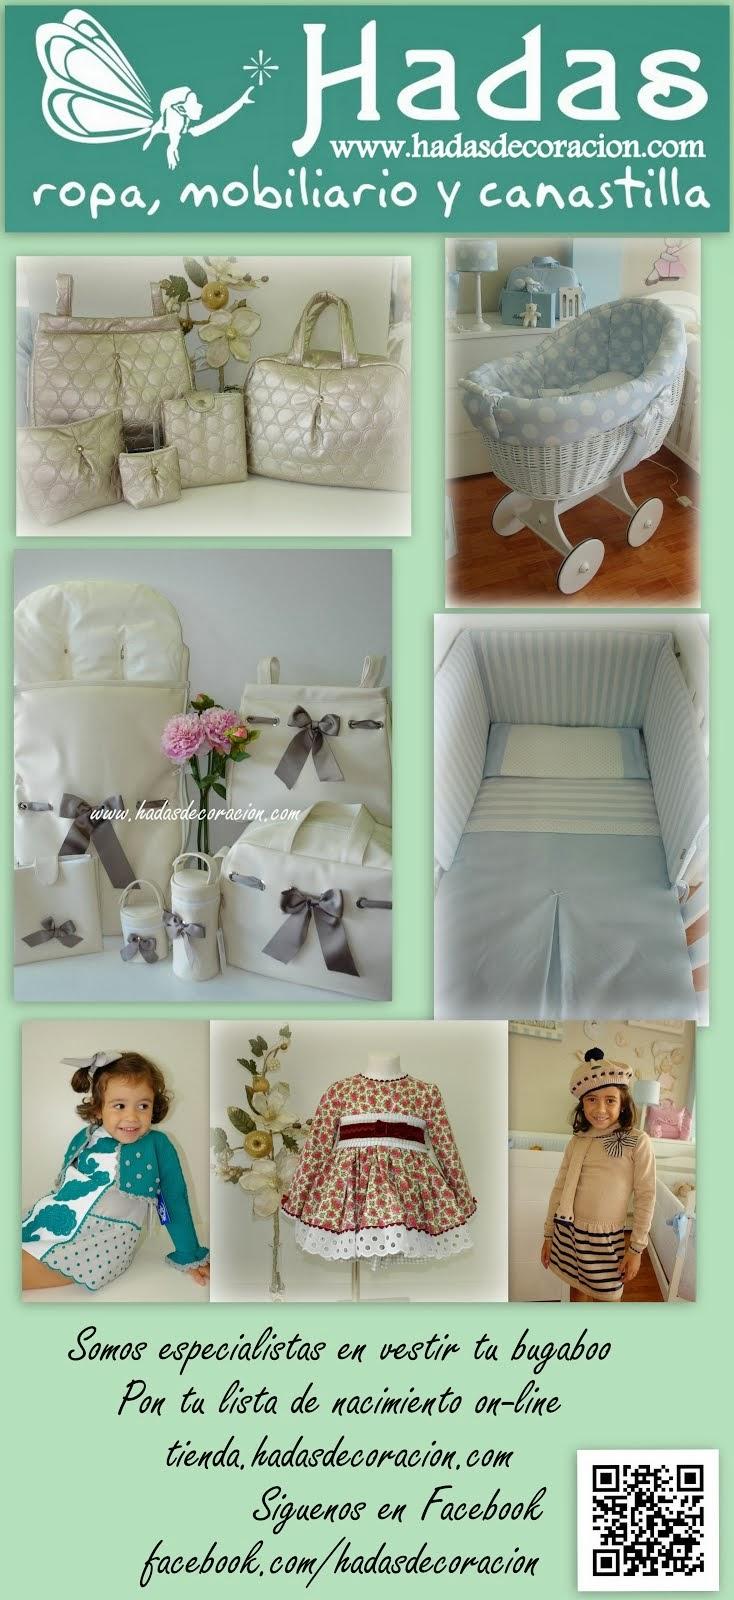 tienda.hadasdecoracion.com